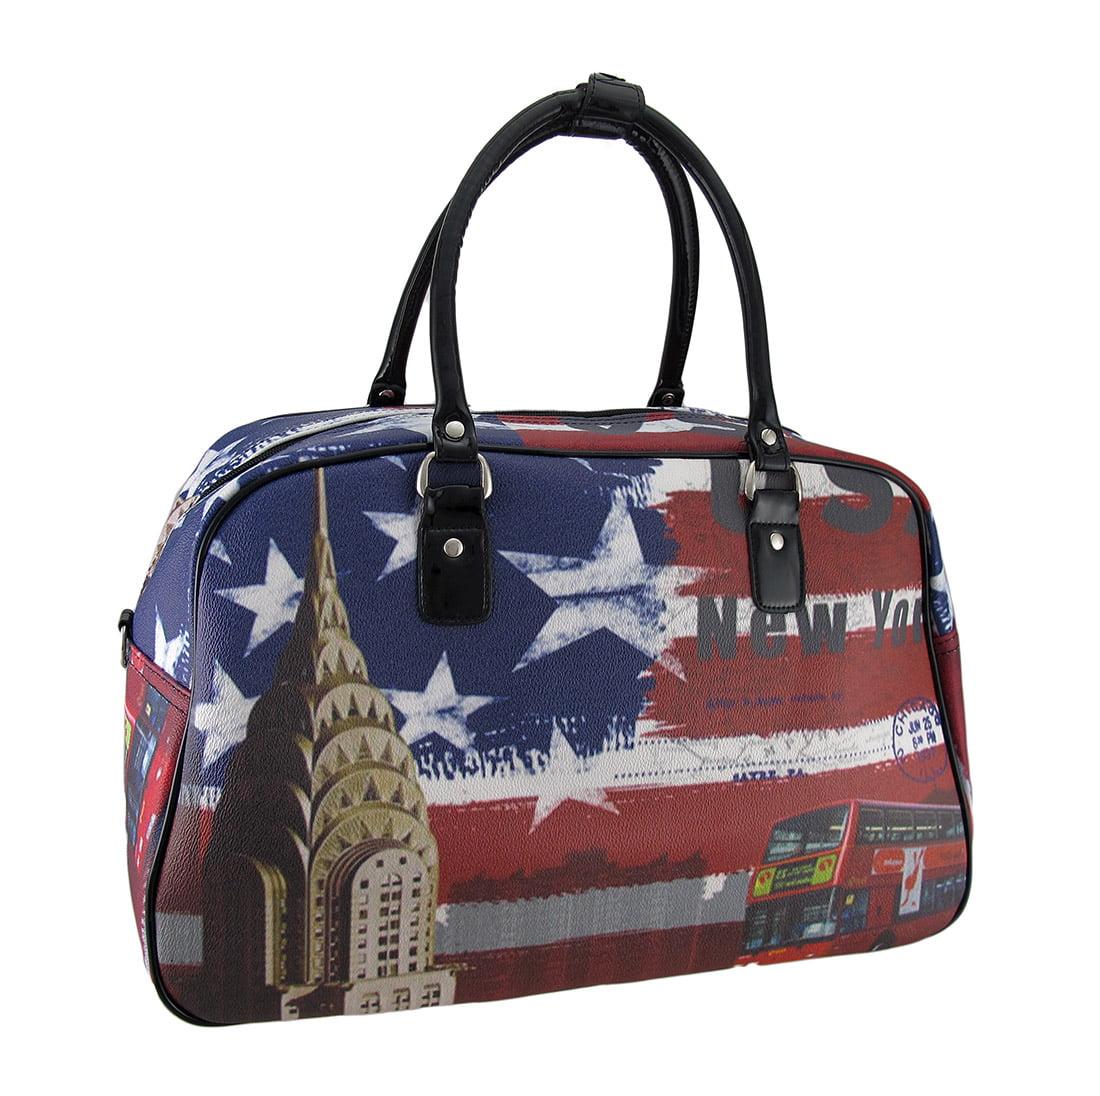 Red White Blue US Flag New York Postcard Print Travel Duffel Bag by Nima Accessories, Inc.